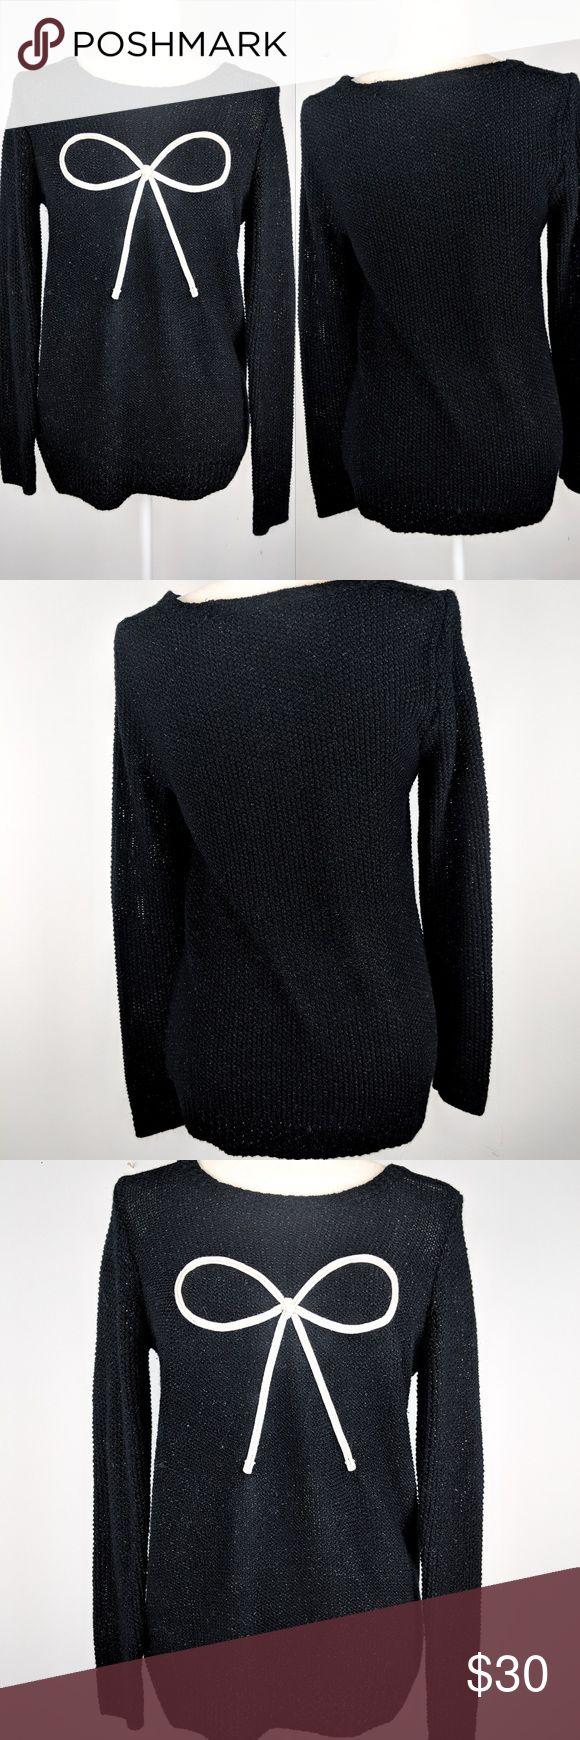 {lauren conrad} lurex bow sweater Lurex bow sweater from LC Lauren Conrad in black and cream. Metallic threading adds a slight glitter effect. Excellent condition! Size medium. LC Lauren Conrad Sweaters Crew & Scoop Necks